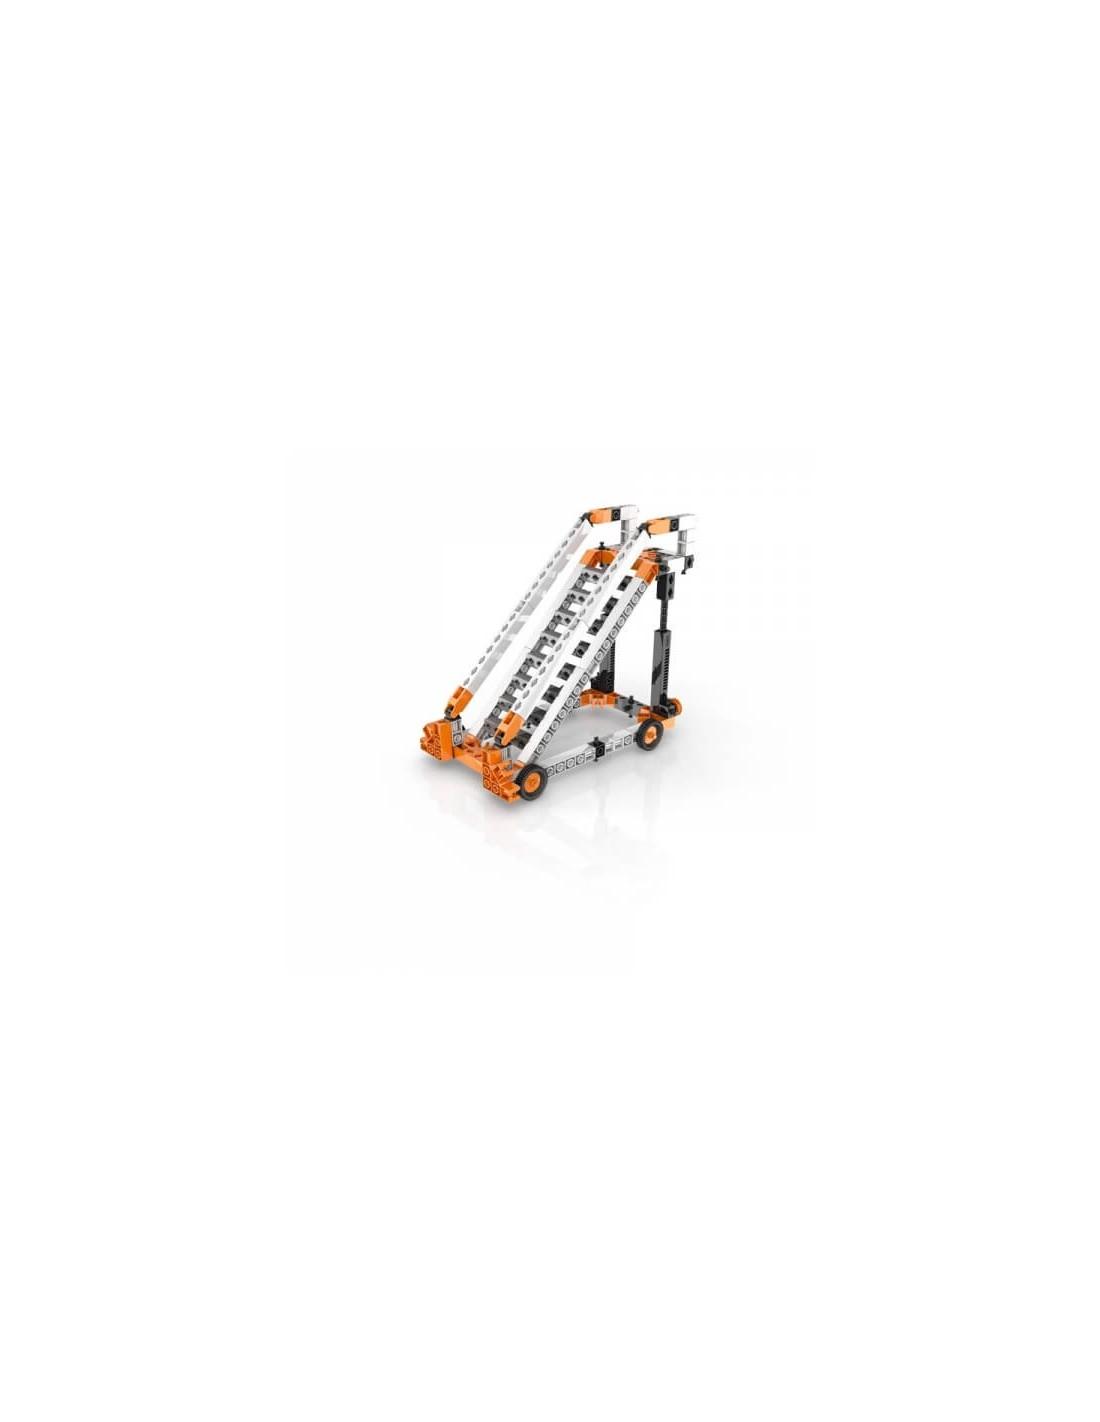 Set de constructie - STEM Wheels, Axles and Inclined Planes | Engino - 1